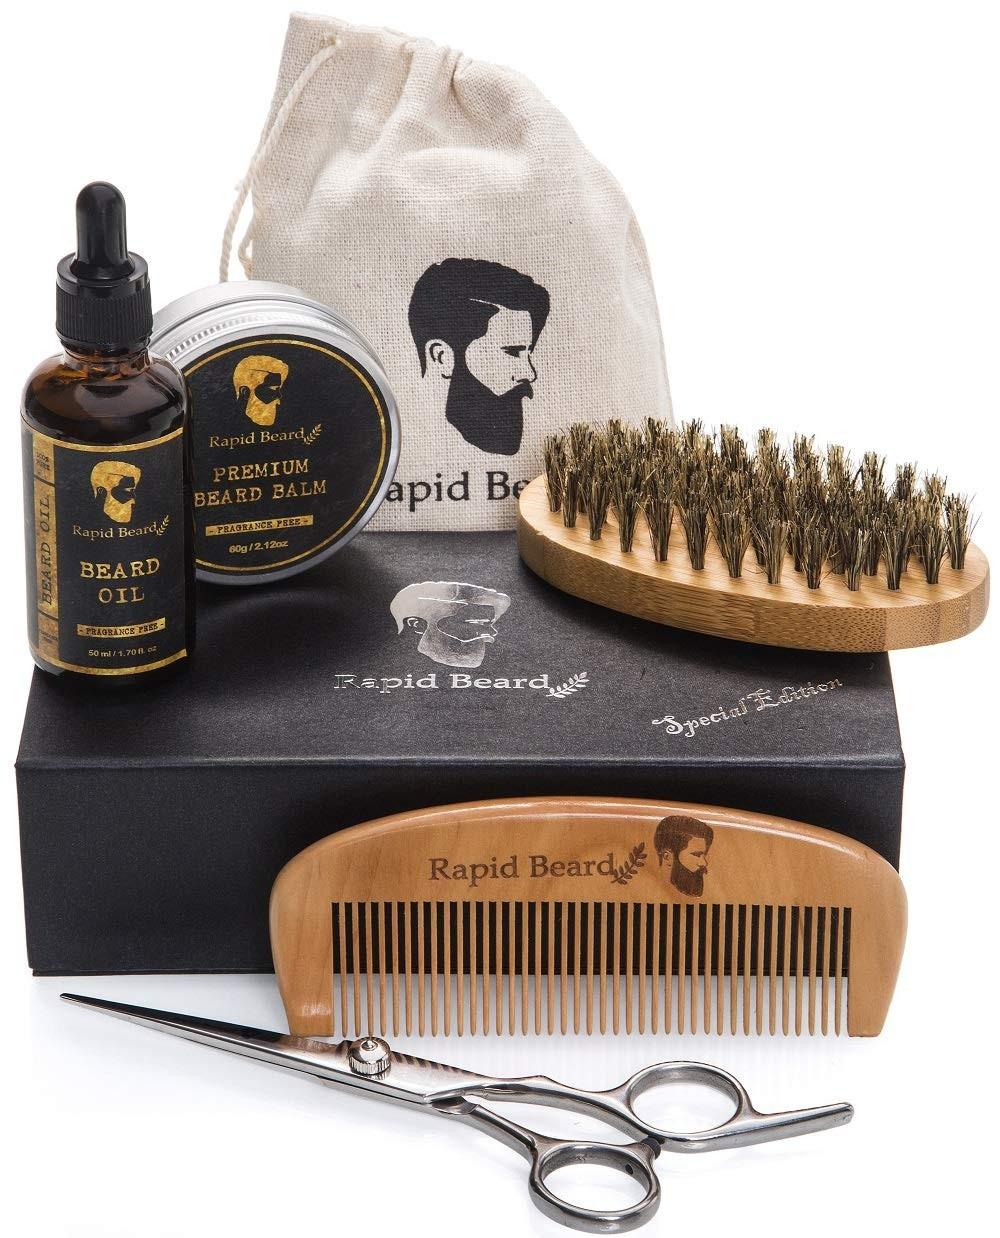 Beard Grooming & Trimming Kit for Men Care - Beard Brush, Beard Comb, Unscented Beard Oil Leave-in